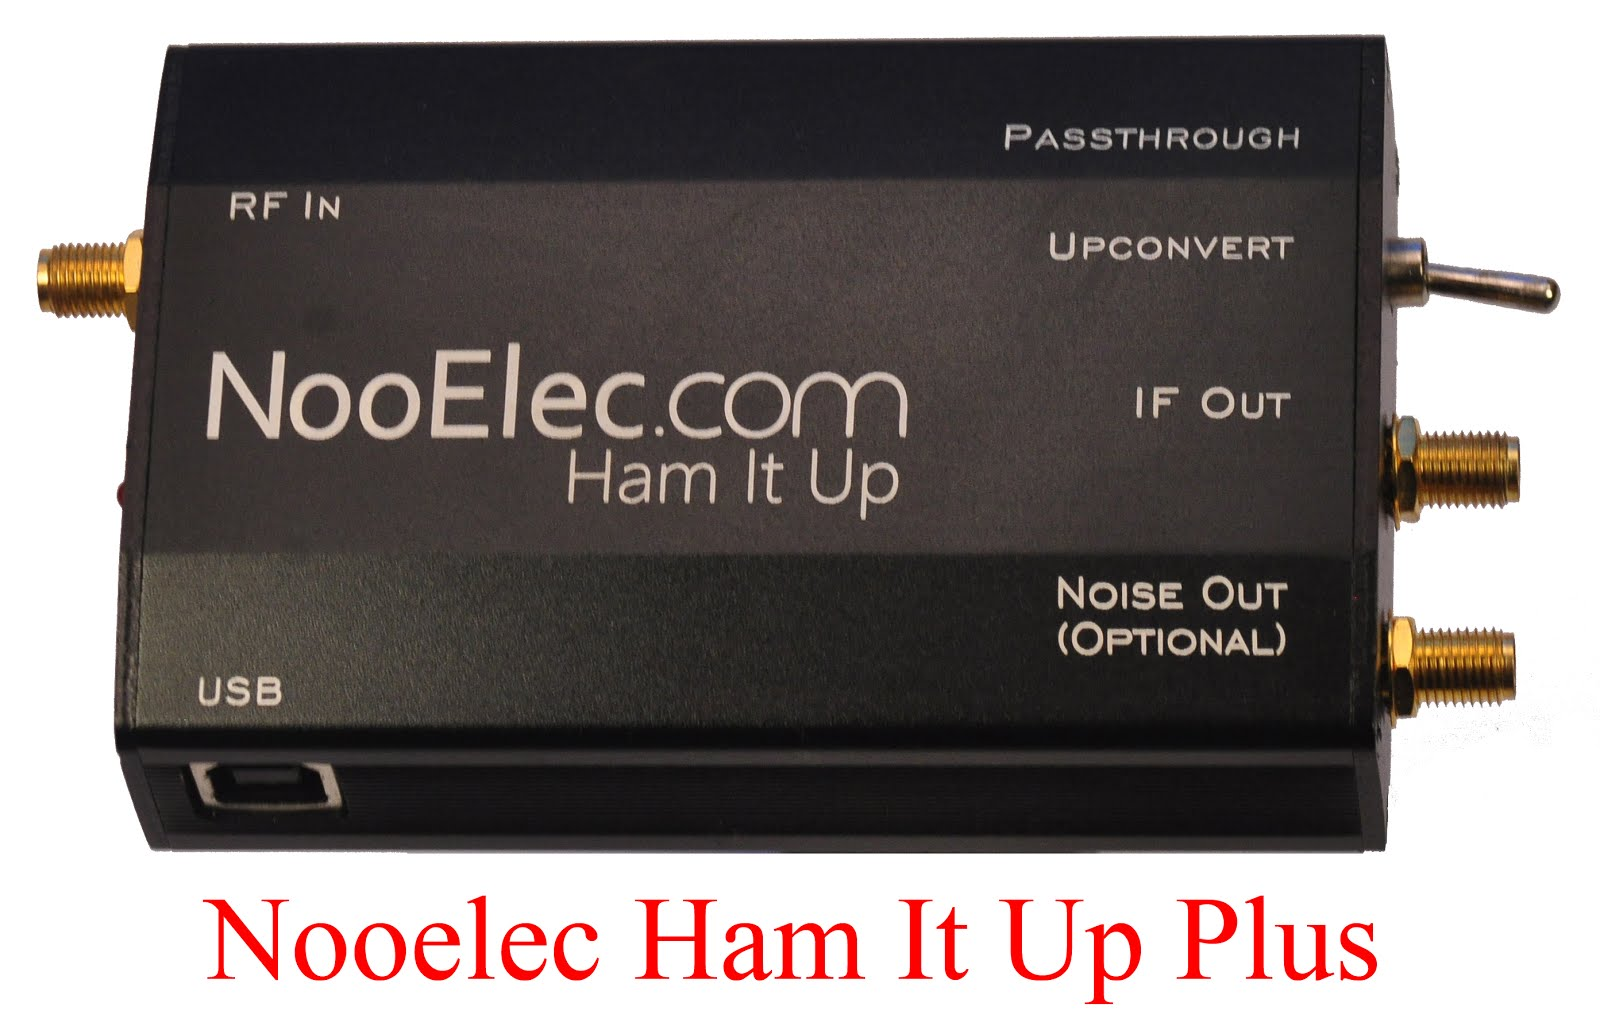 Nooelec Ham It Up Plus upconverter / noise source | Radio for Everyone